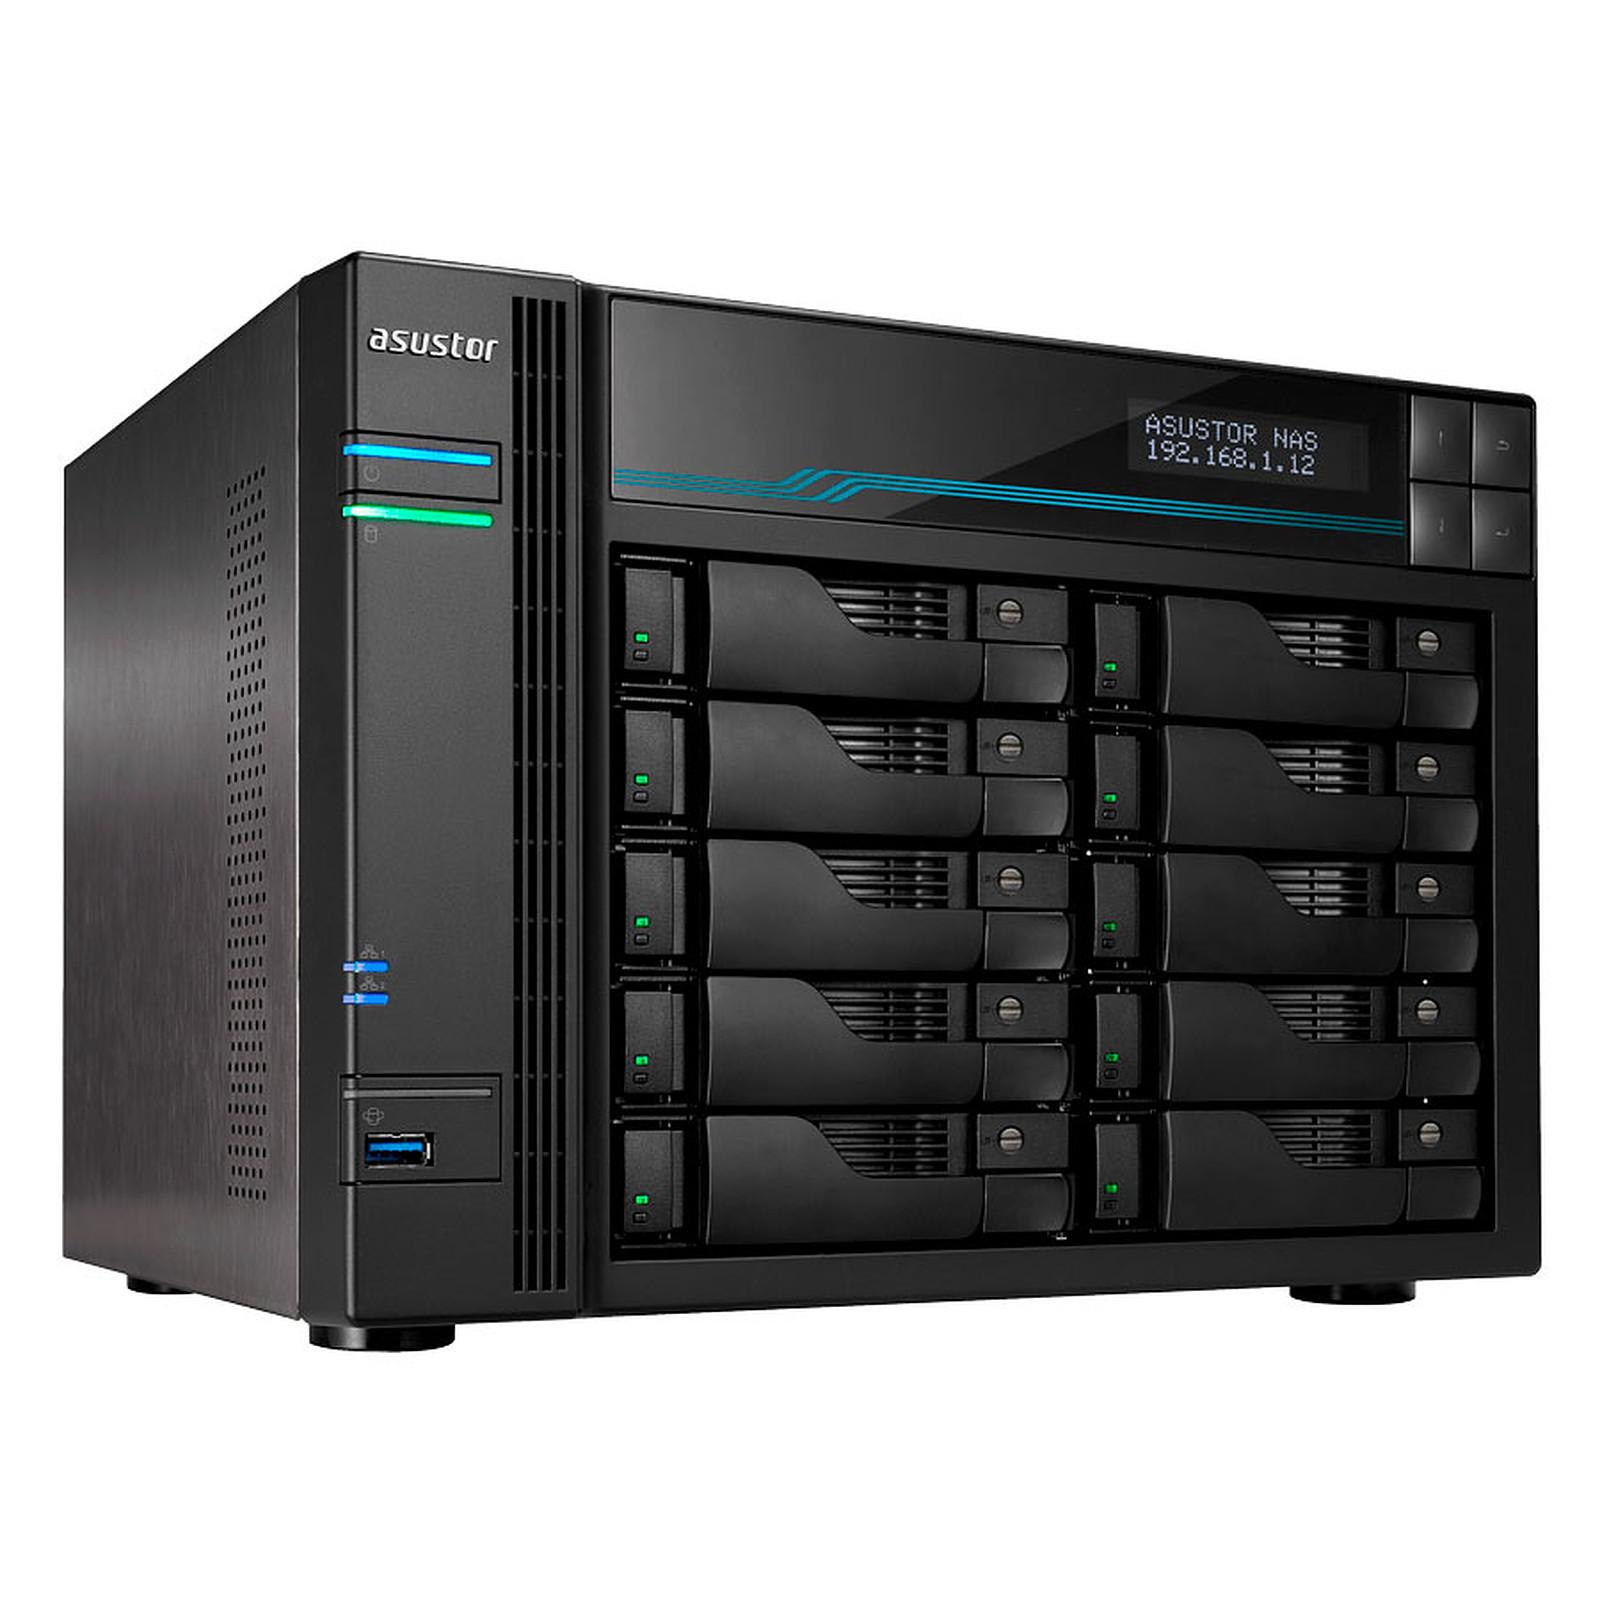 ASUSTORLockerstor 10 Pro (AS7110T)